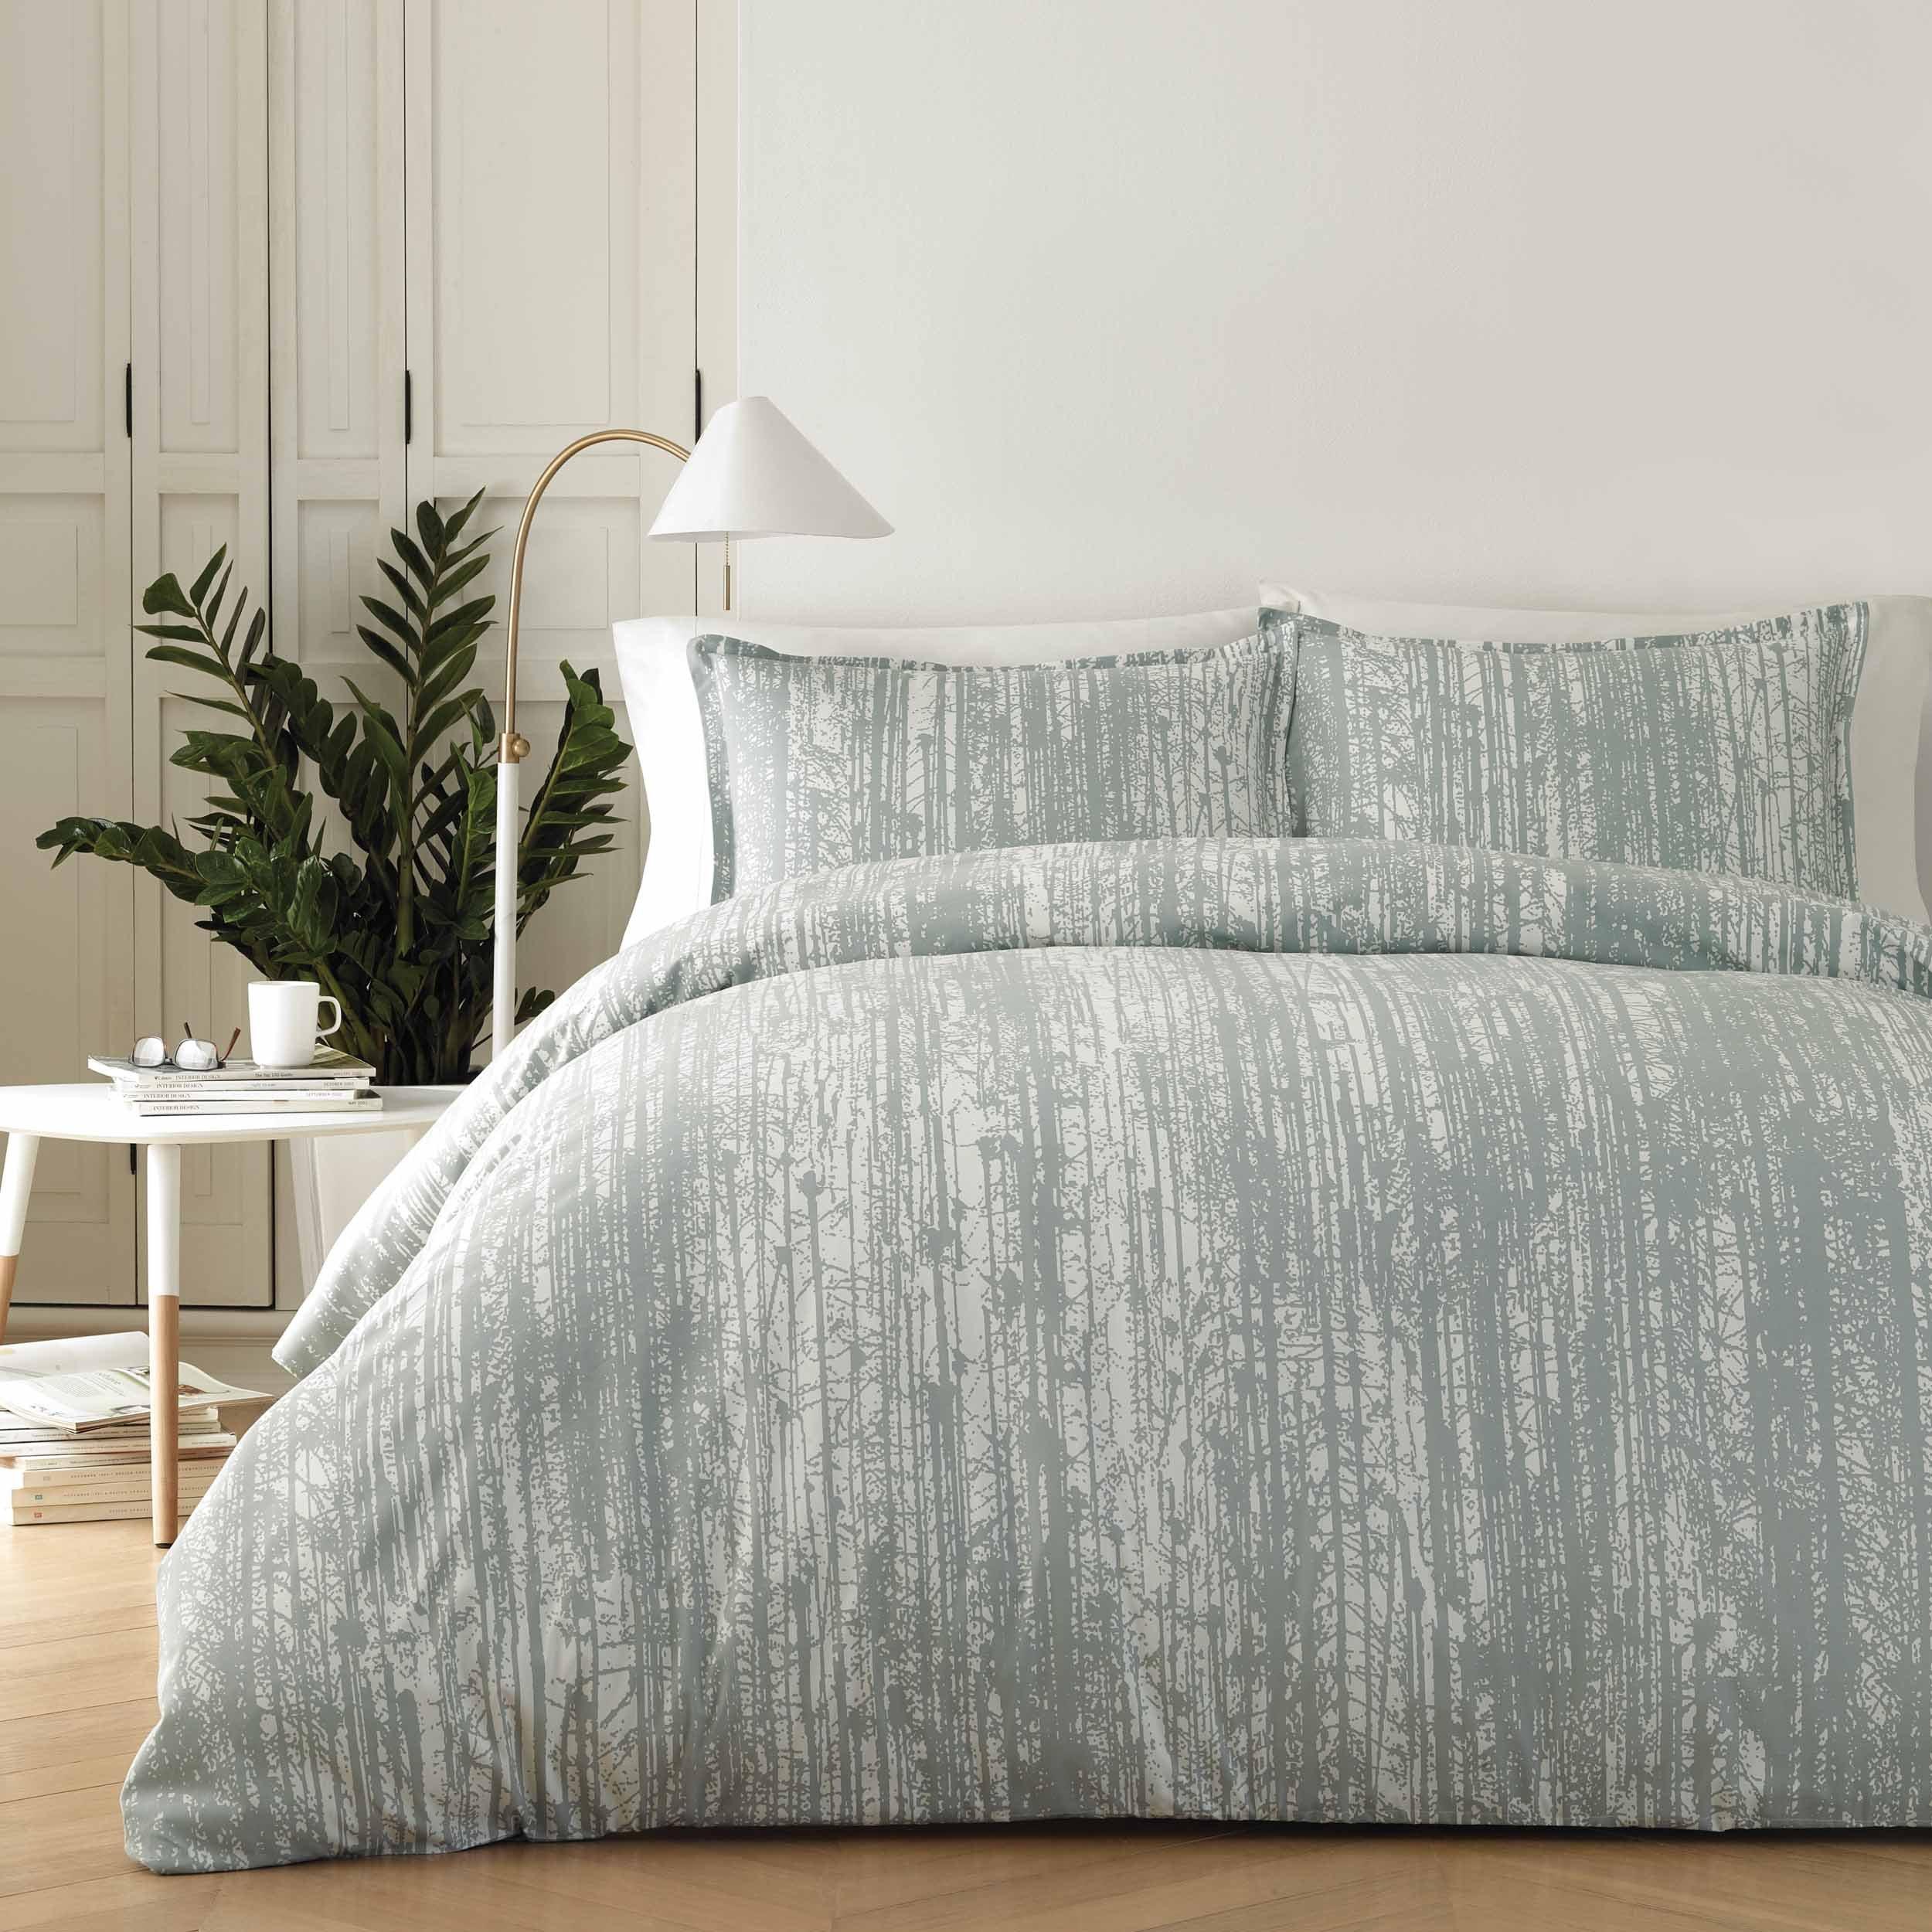 marimekko pihkassa pieni letto duvet cover set full queen green 883893508903 ebay. Black Bedroom Furniture Sets. Home Design Ideas